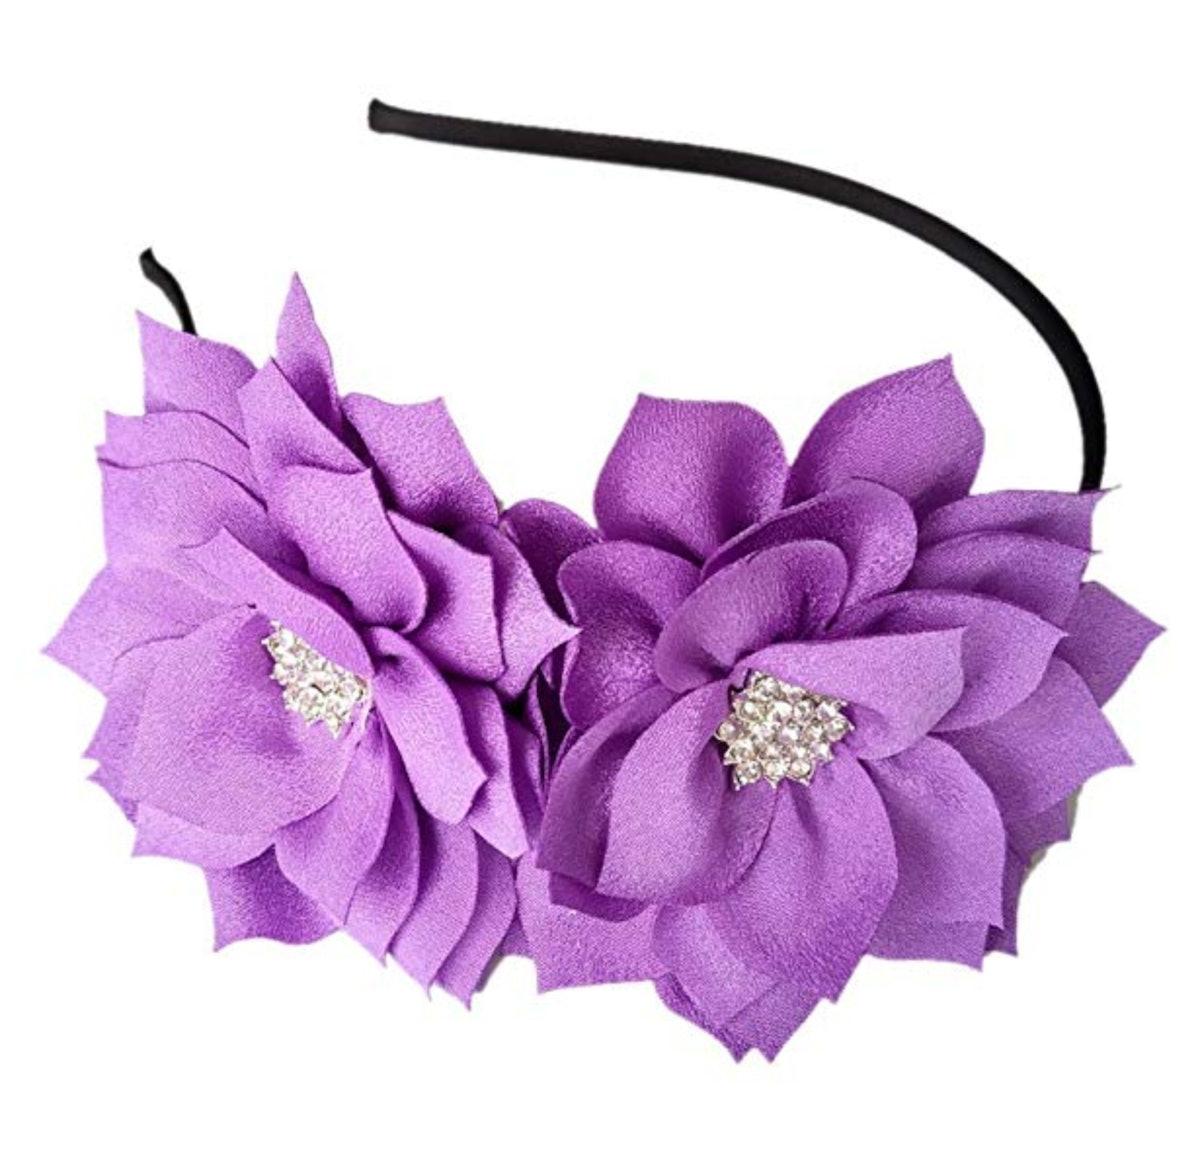 Coolwife Fascinator Headband Hair Clip Lotus Flower Headpiece